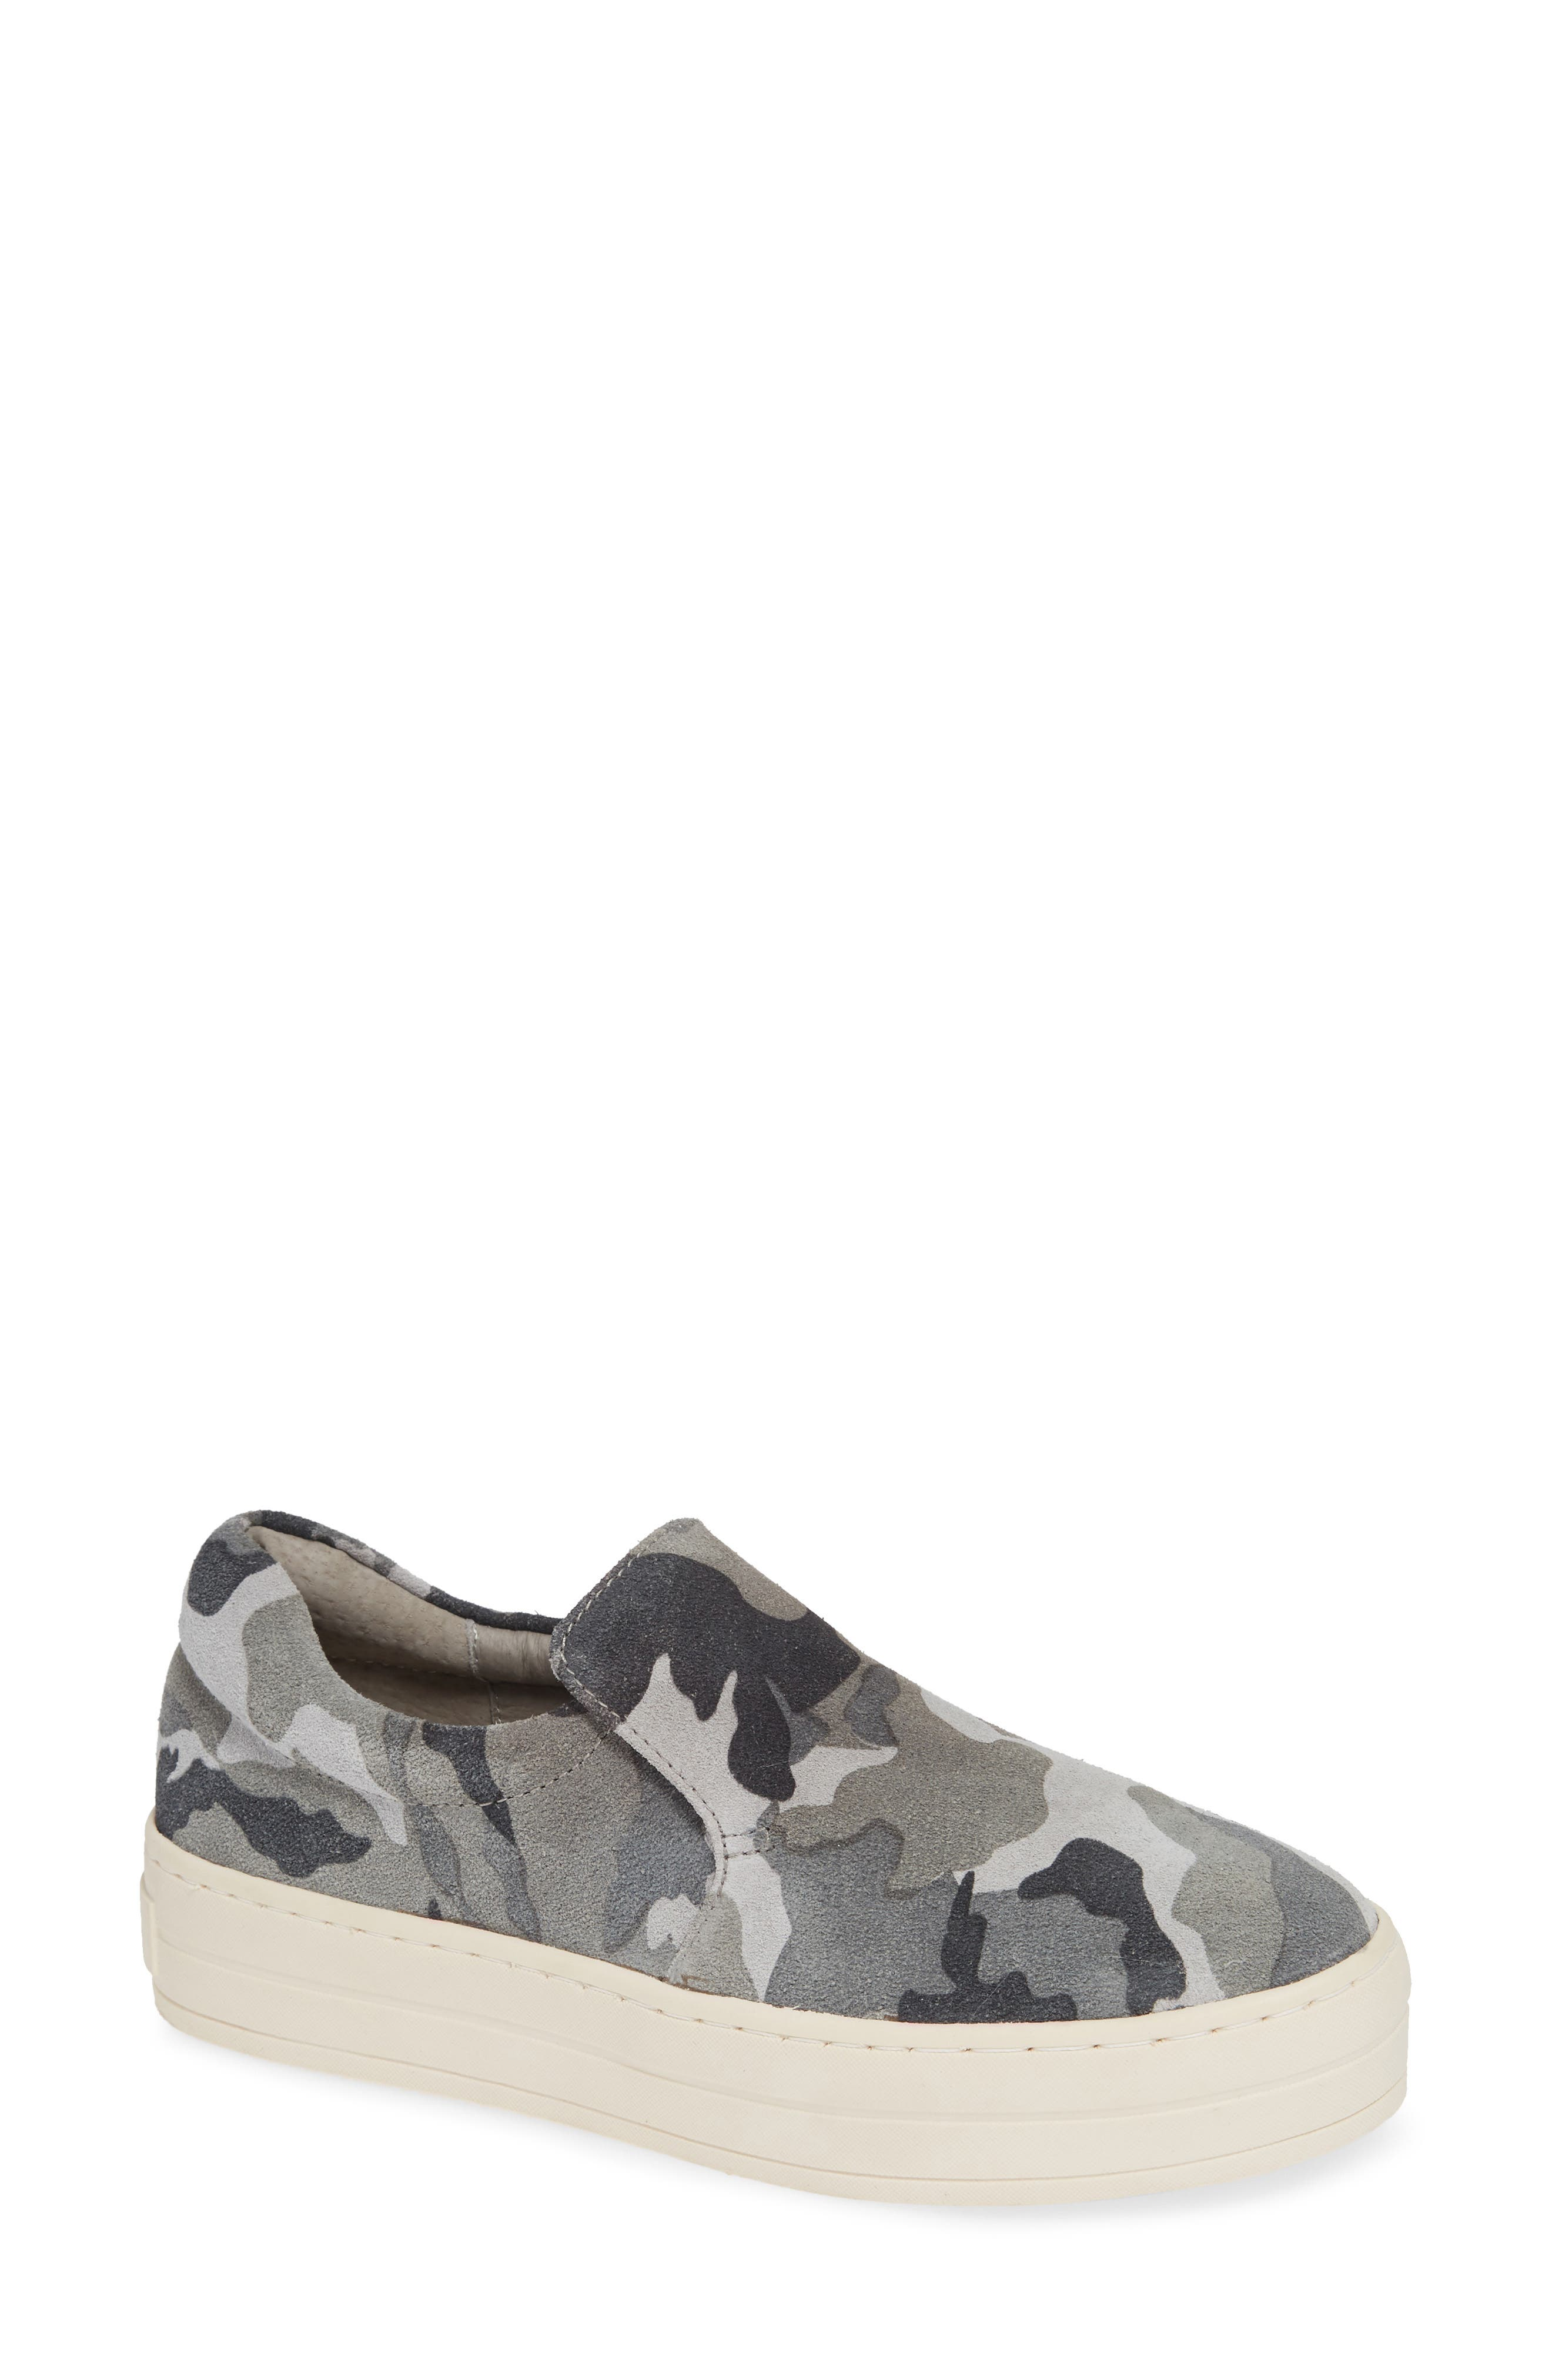 Harry Slip-On Sneaker in Grey Camo Suede